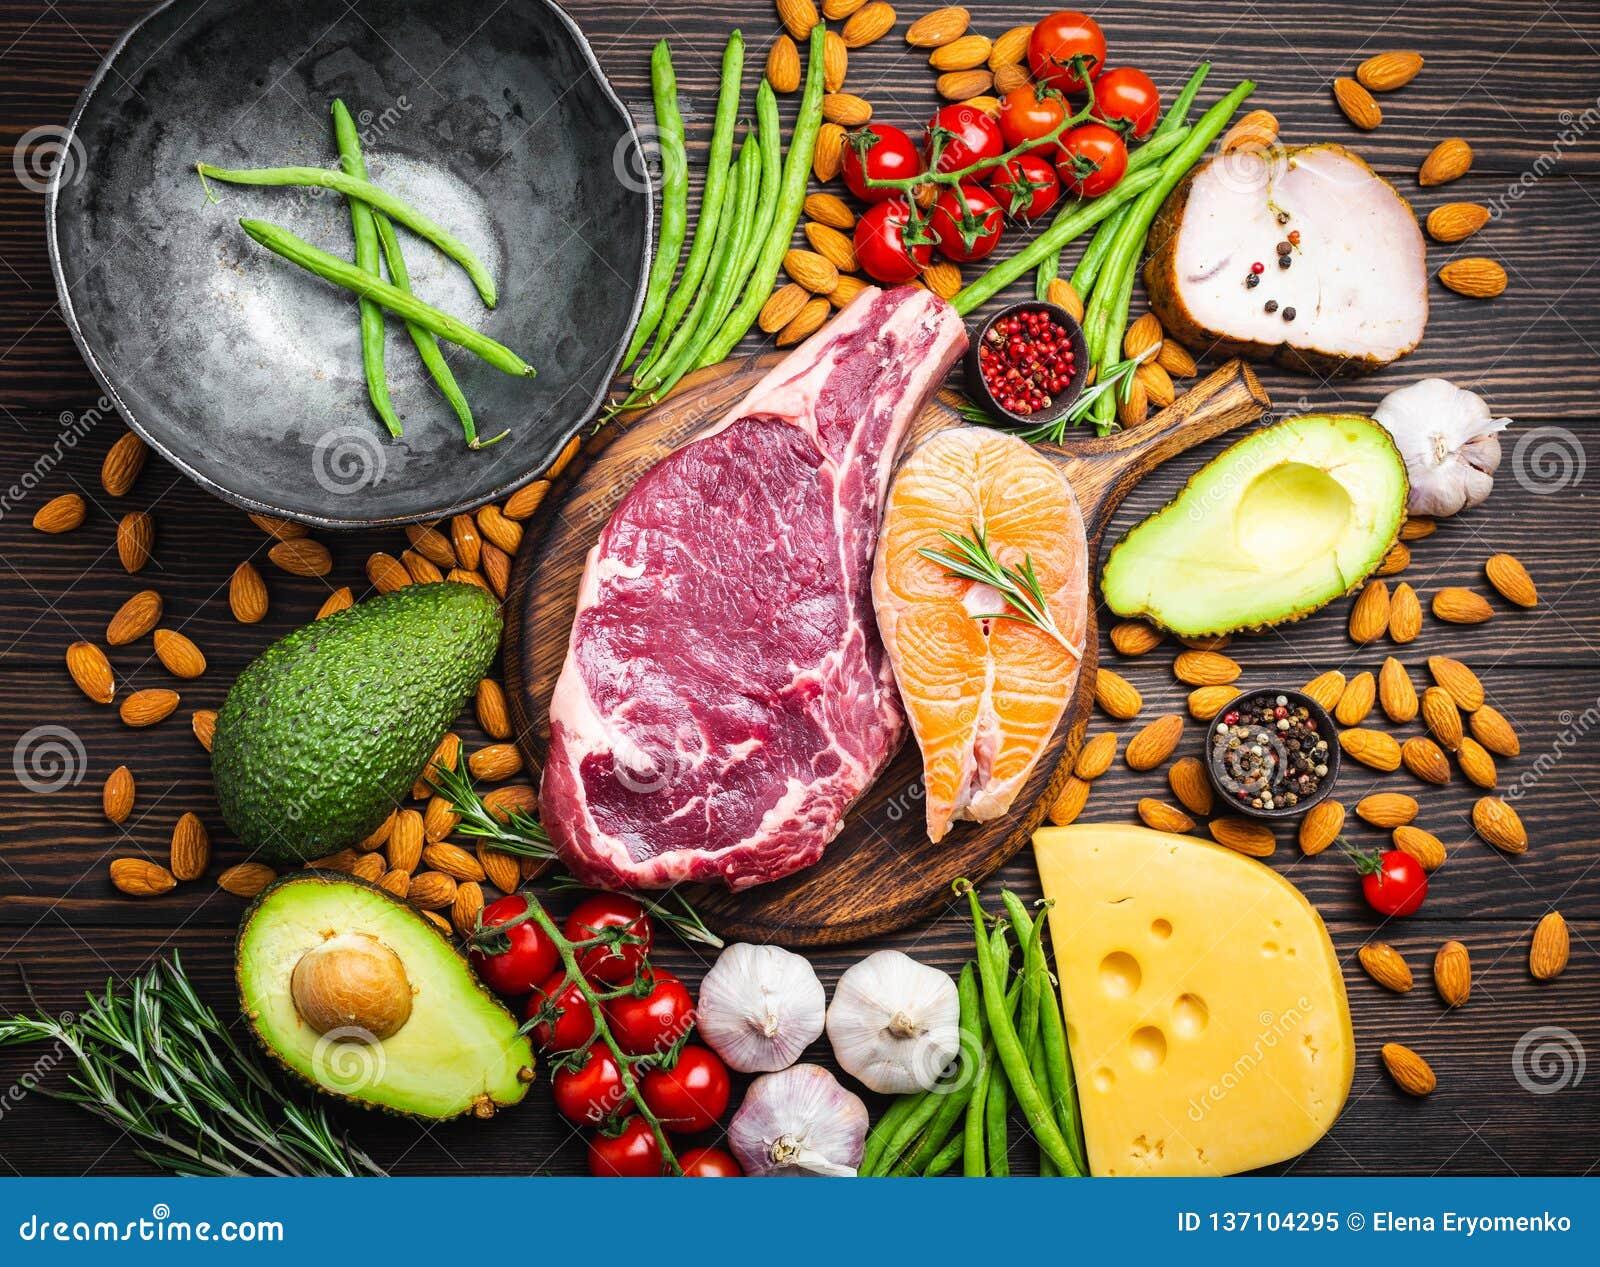 Keto diet foods stock image. Image of fork, nutrition ...